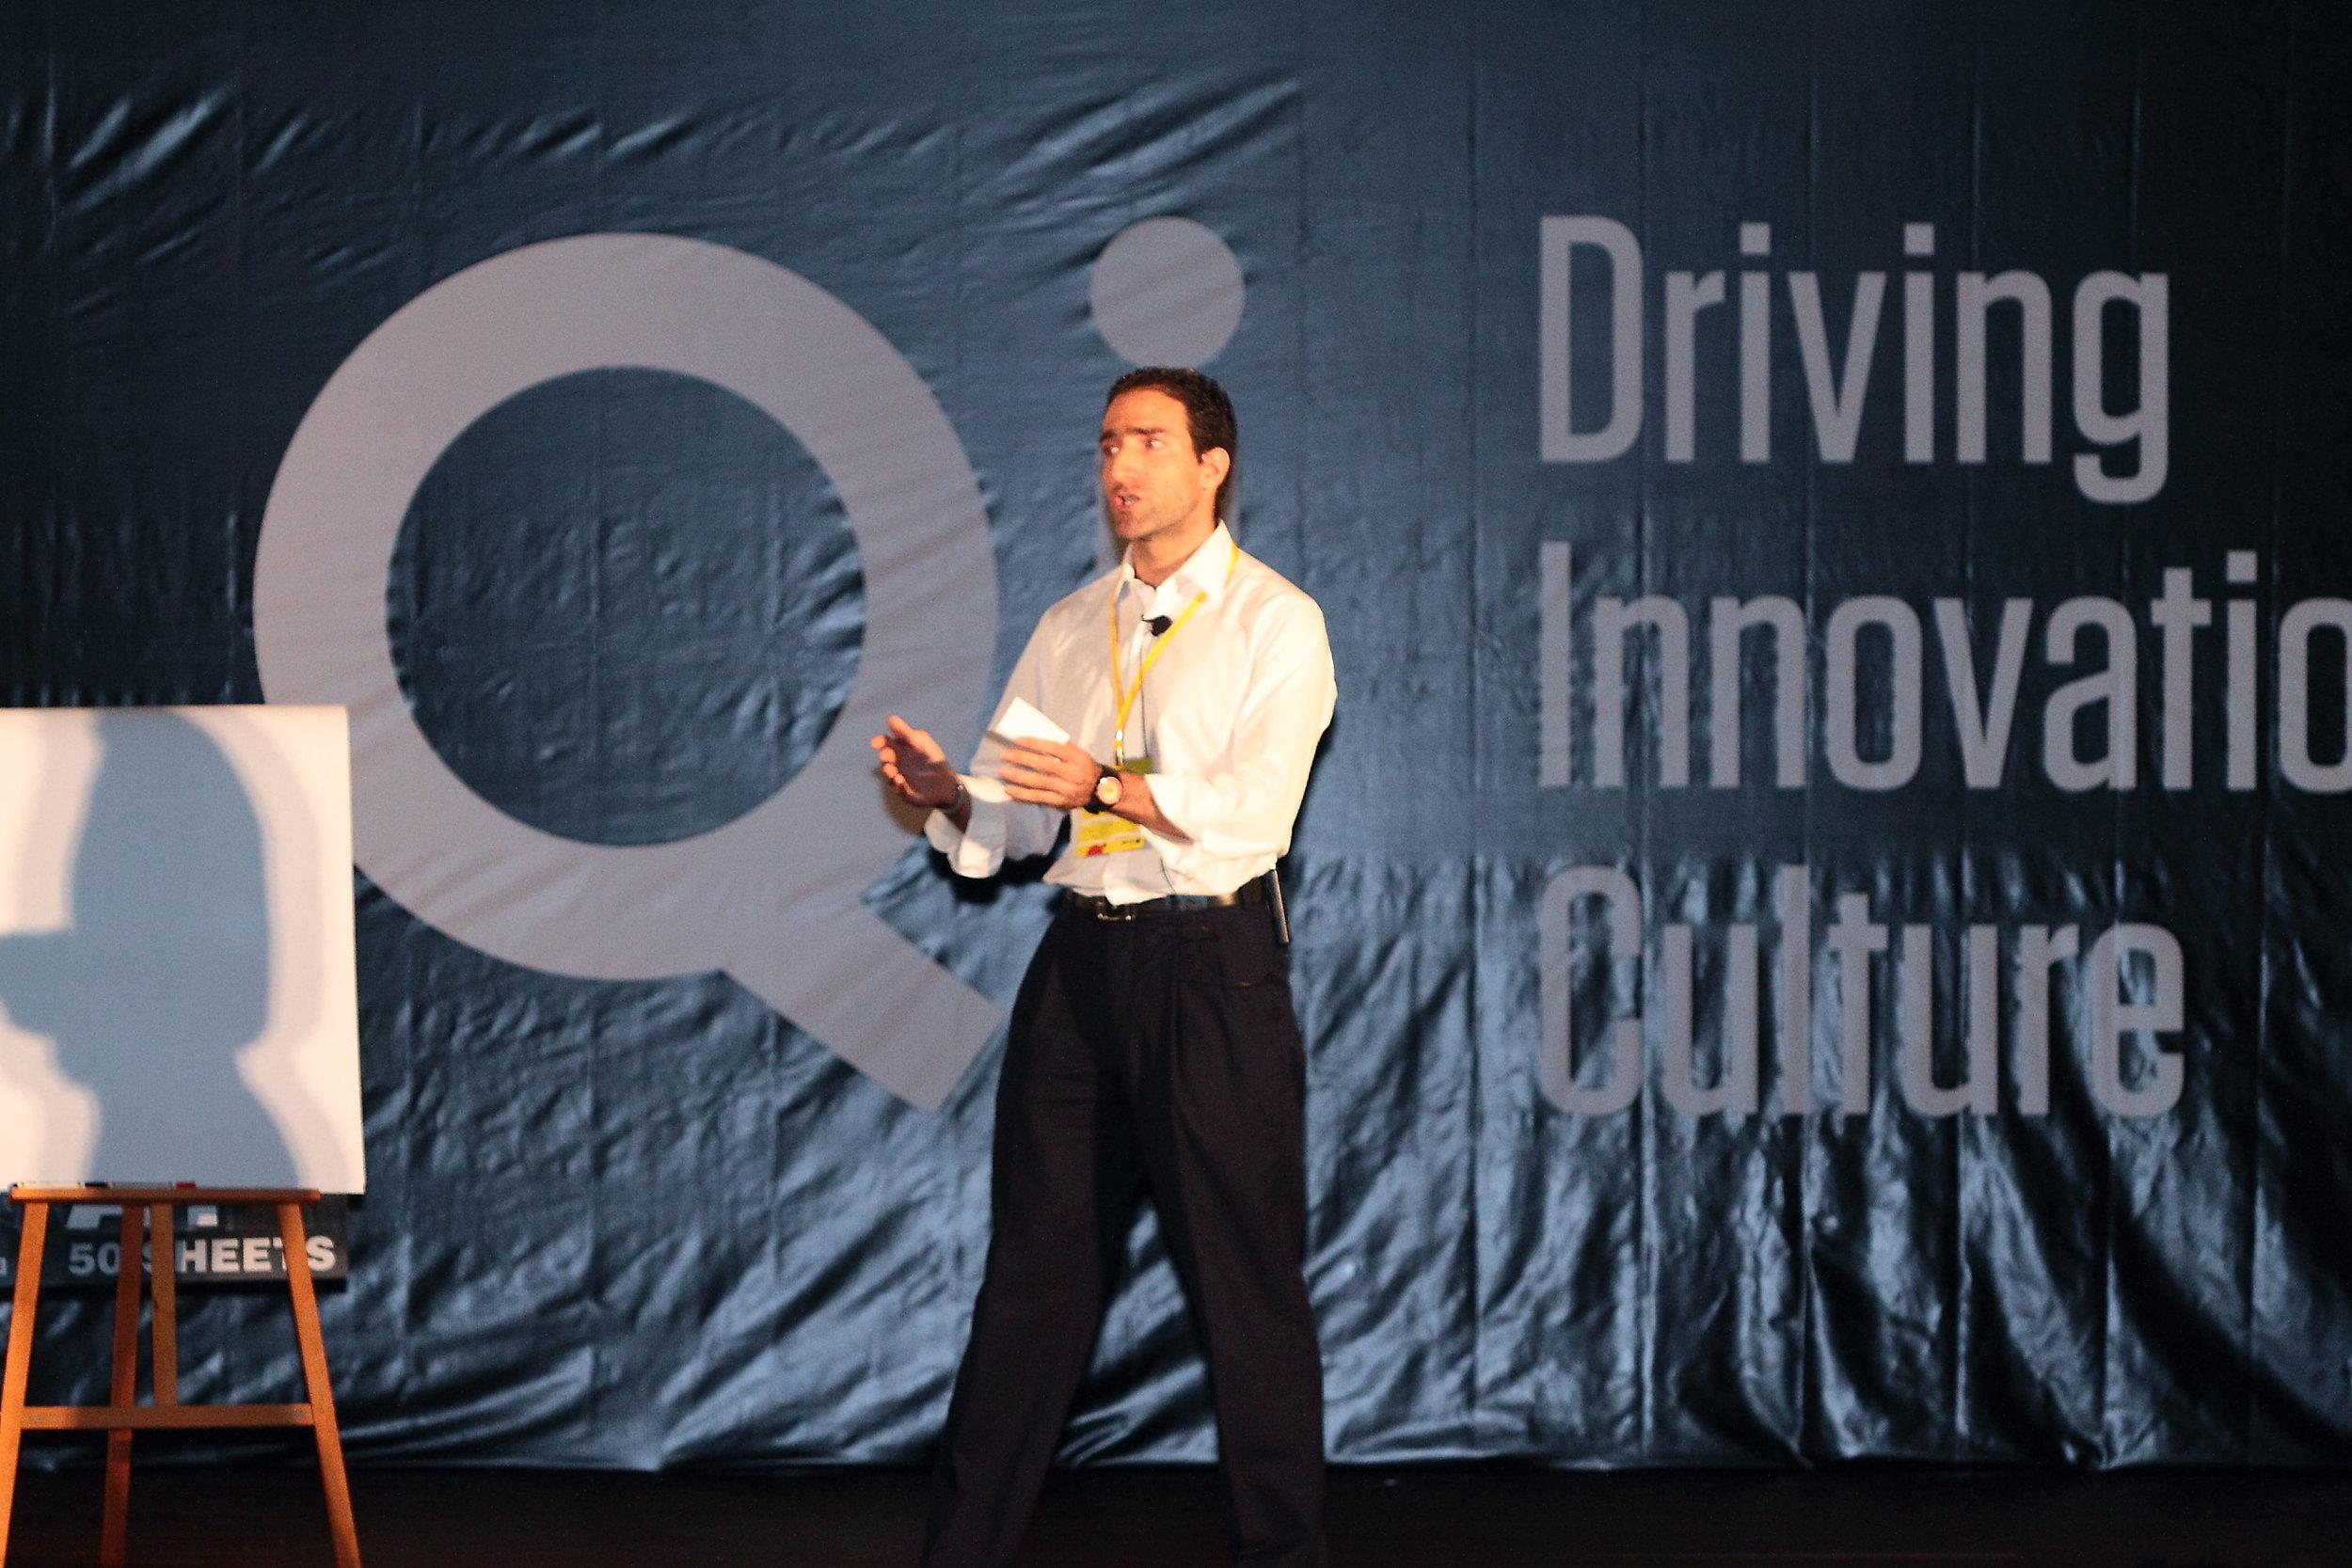 qi-global-2011-driving-innovation-culture-066.jpg